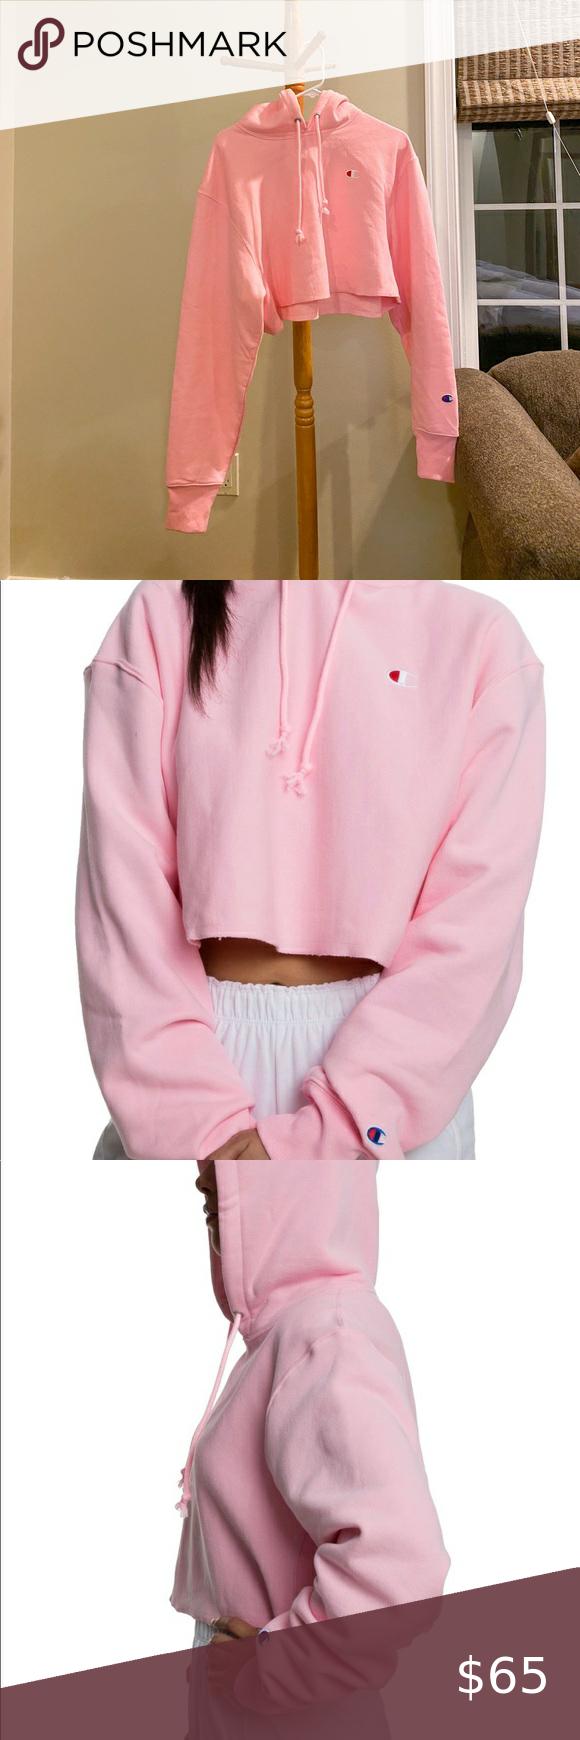 Cropped Pink Champion Hoodie Champion Hoodie Pink Champion Hoodie Hoodies [ 1740 x 580 Pixel ]